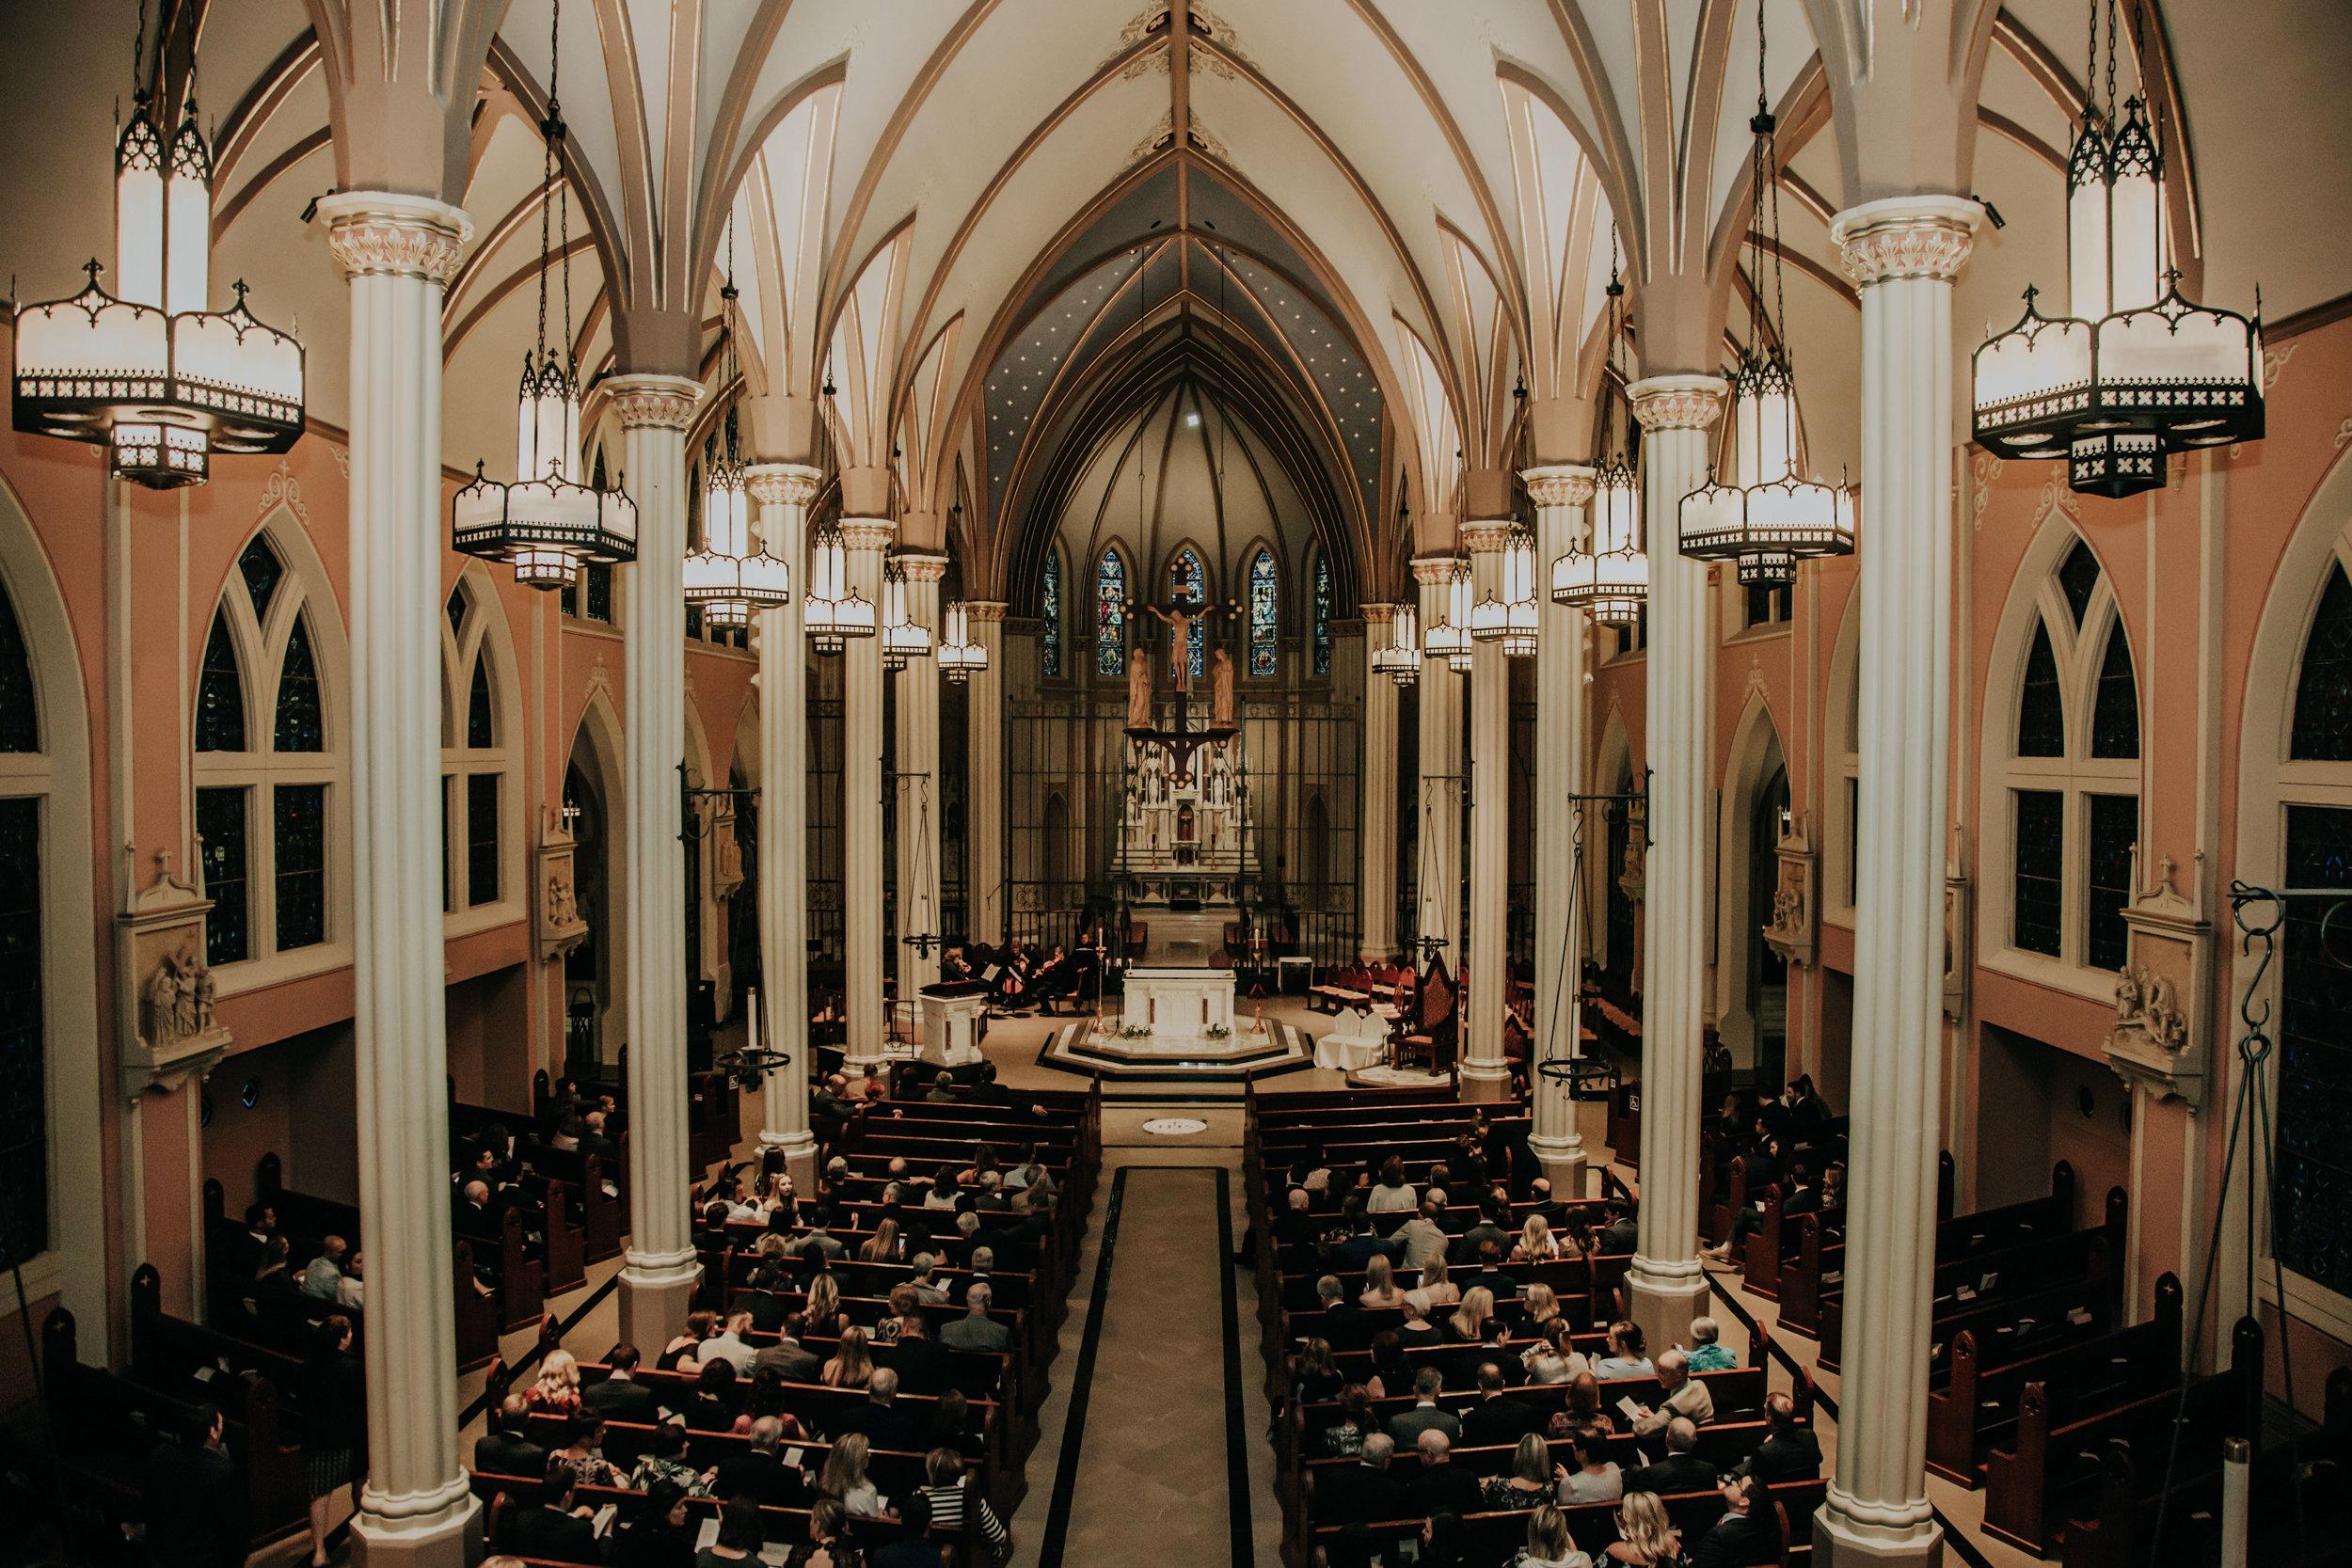 inside-view-st-johns-church-at-creighton-omaha-nebraska-raelyn-ramey-photography.jpg